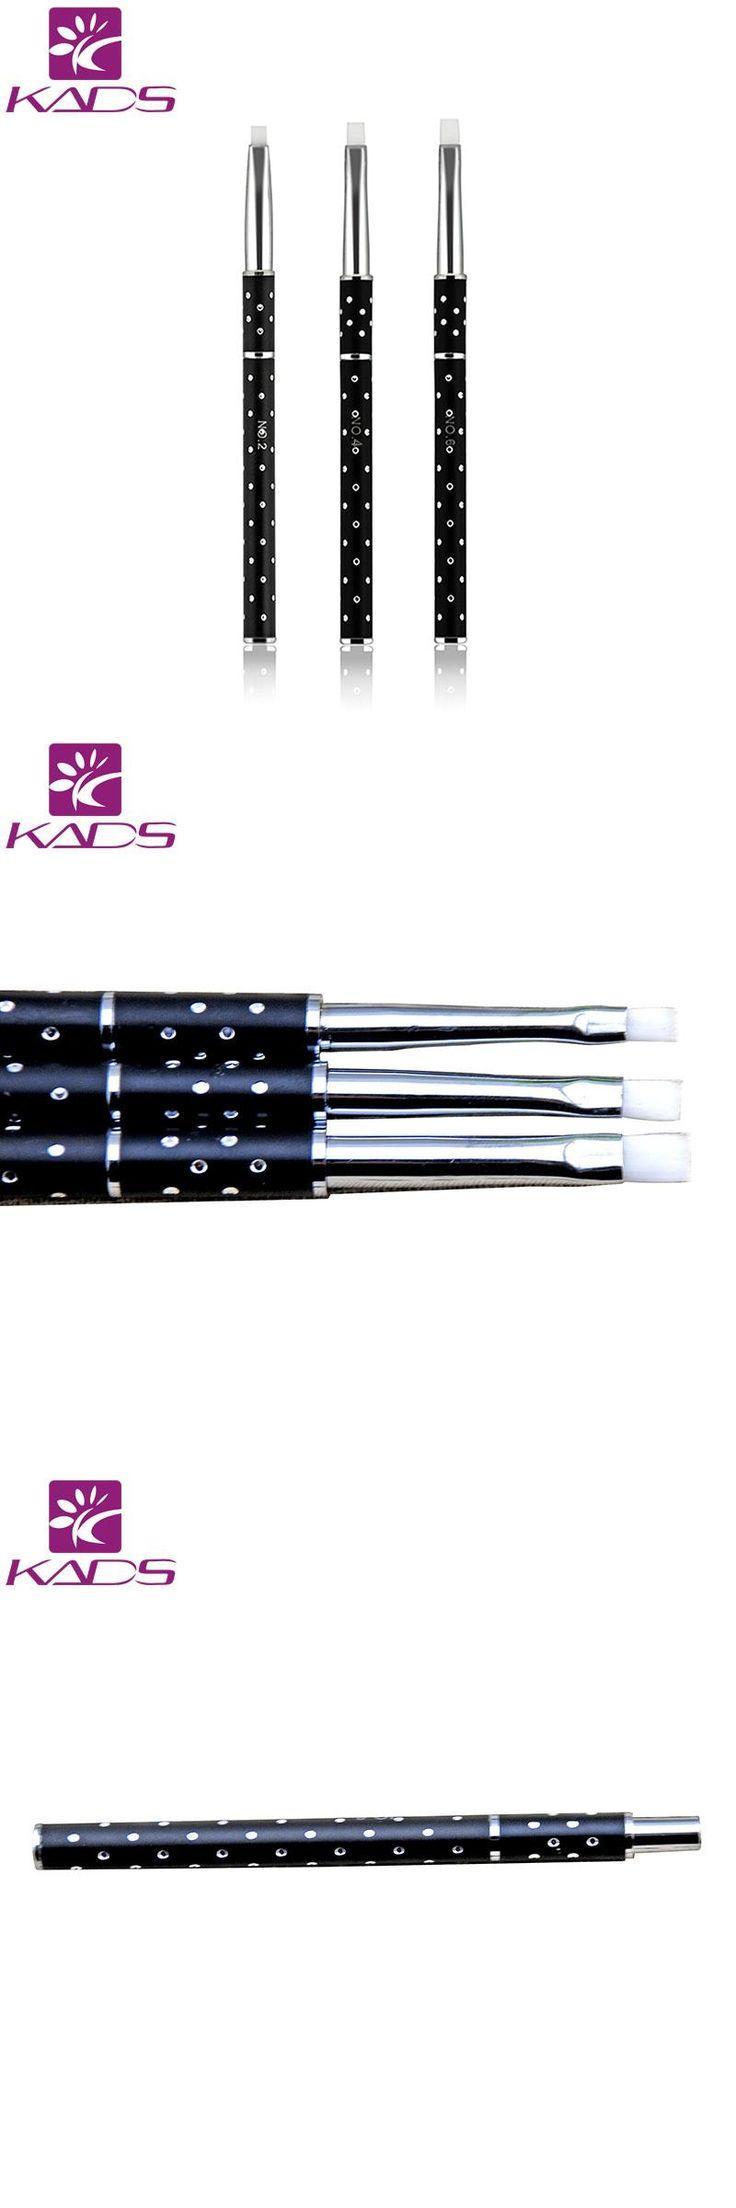 [Visit to Buy] KADS 3pcs/set SIZE 2#/4#/6# Acrylic Nail Art Builder hair Brush Drawing Pen Nail Brush Kit Painting Tools Nail Art uv gel brush #Advertisement